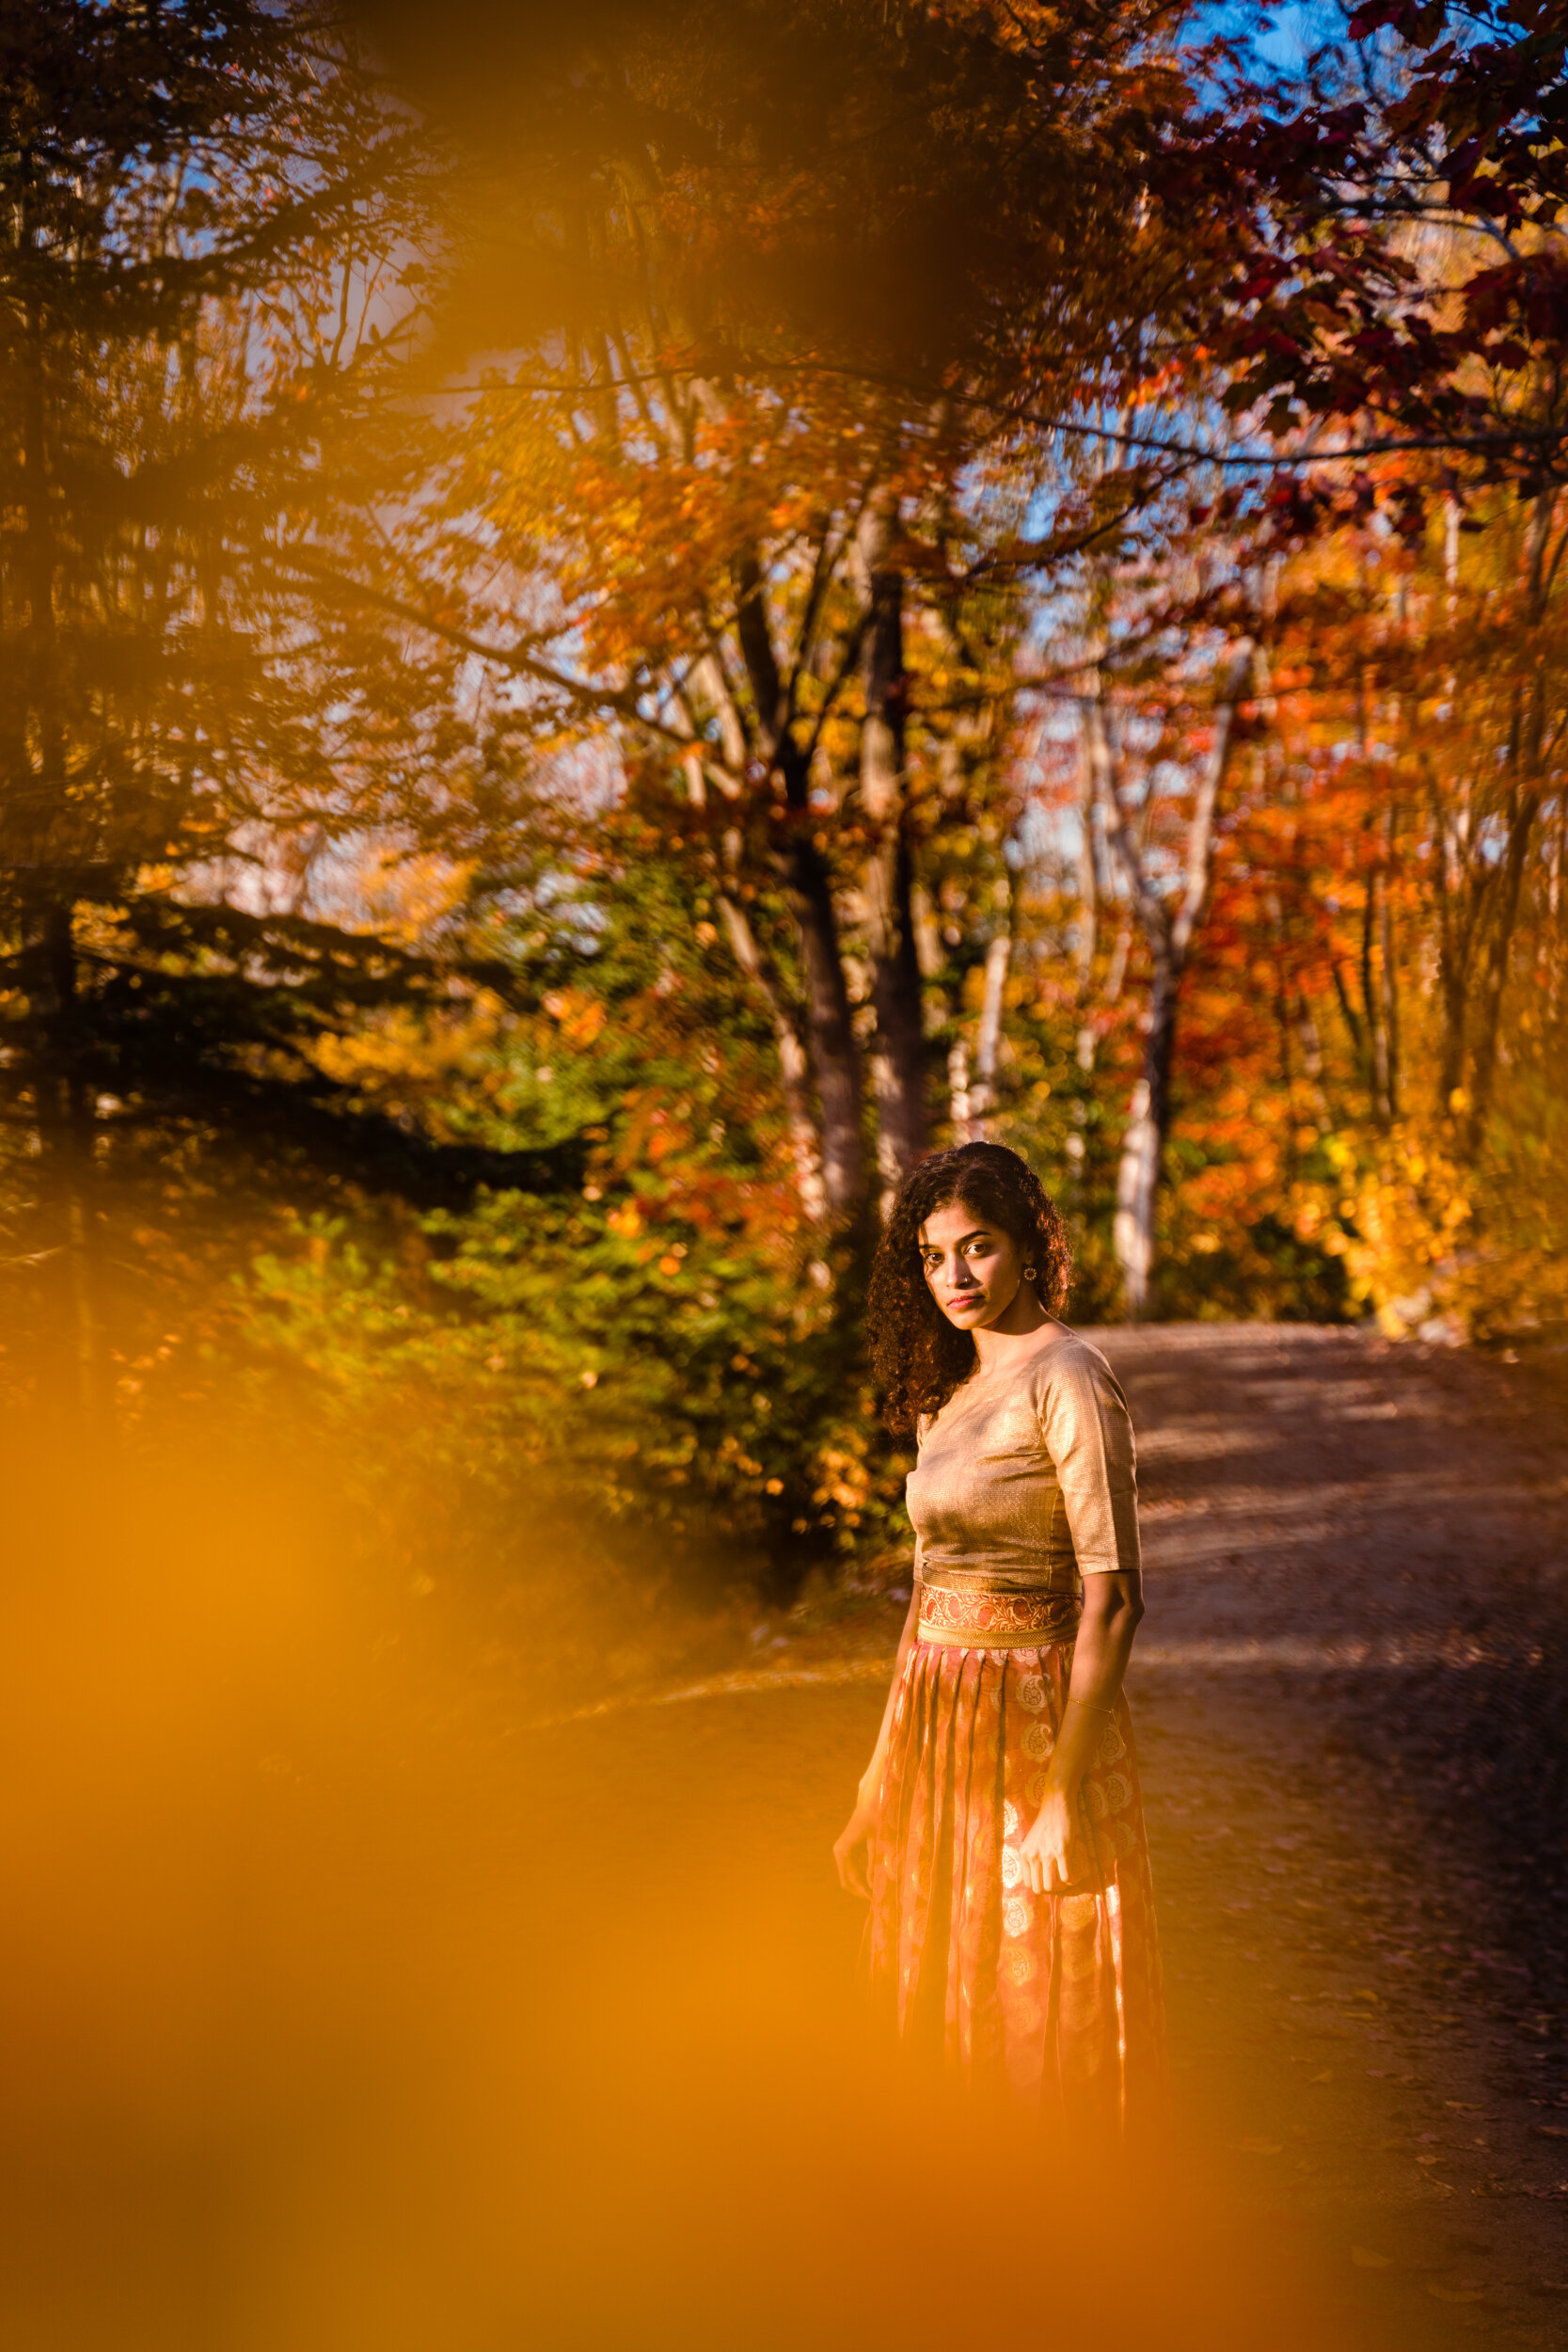 AJFallSession (4 of 14)halifax-photography-portrait-foxandfellow-fall.jpg